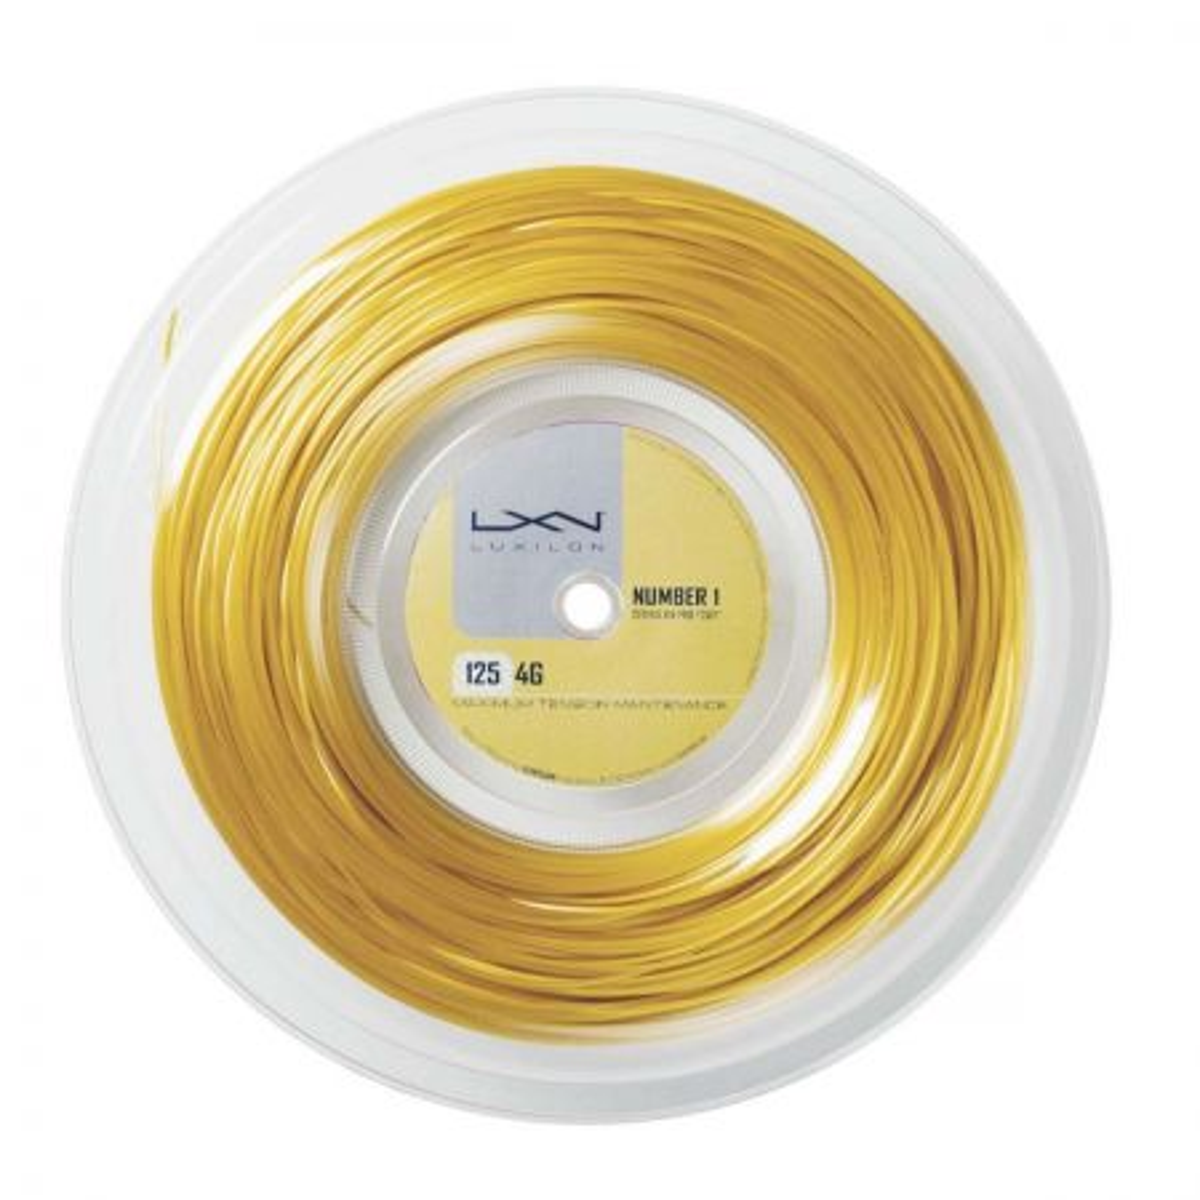 Wilson Luxilon 4g 1.25mm/200m žica za teniske rekete